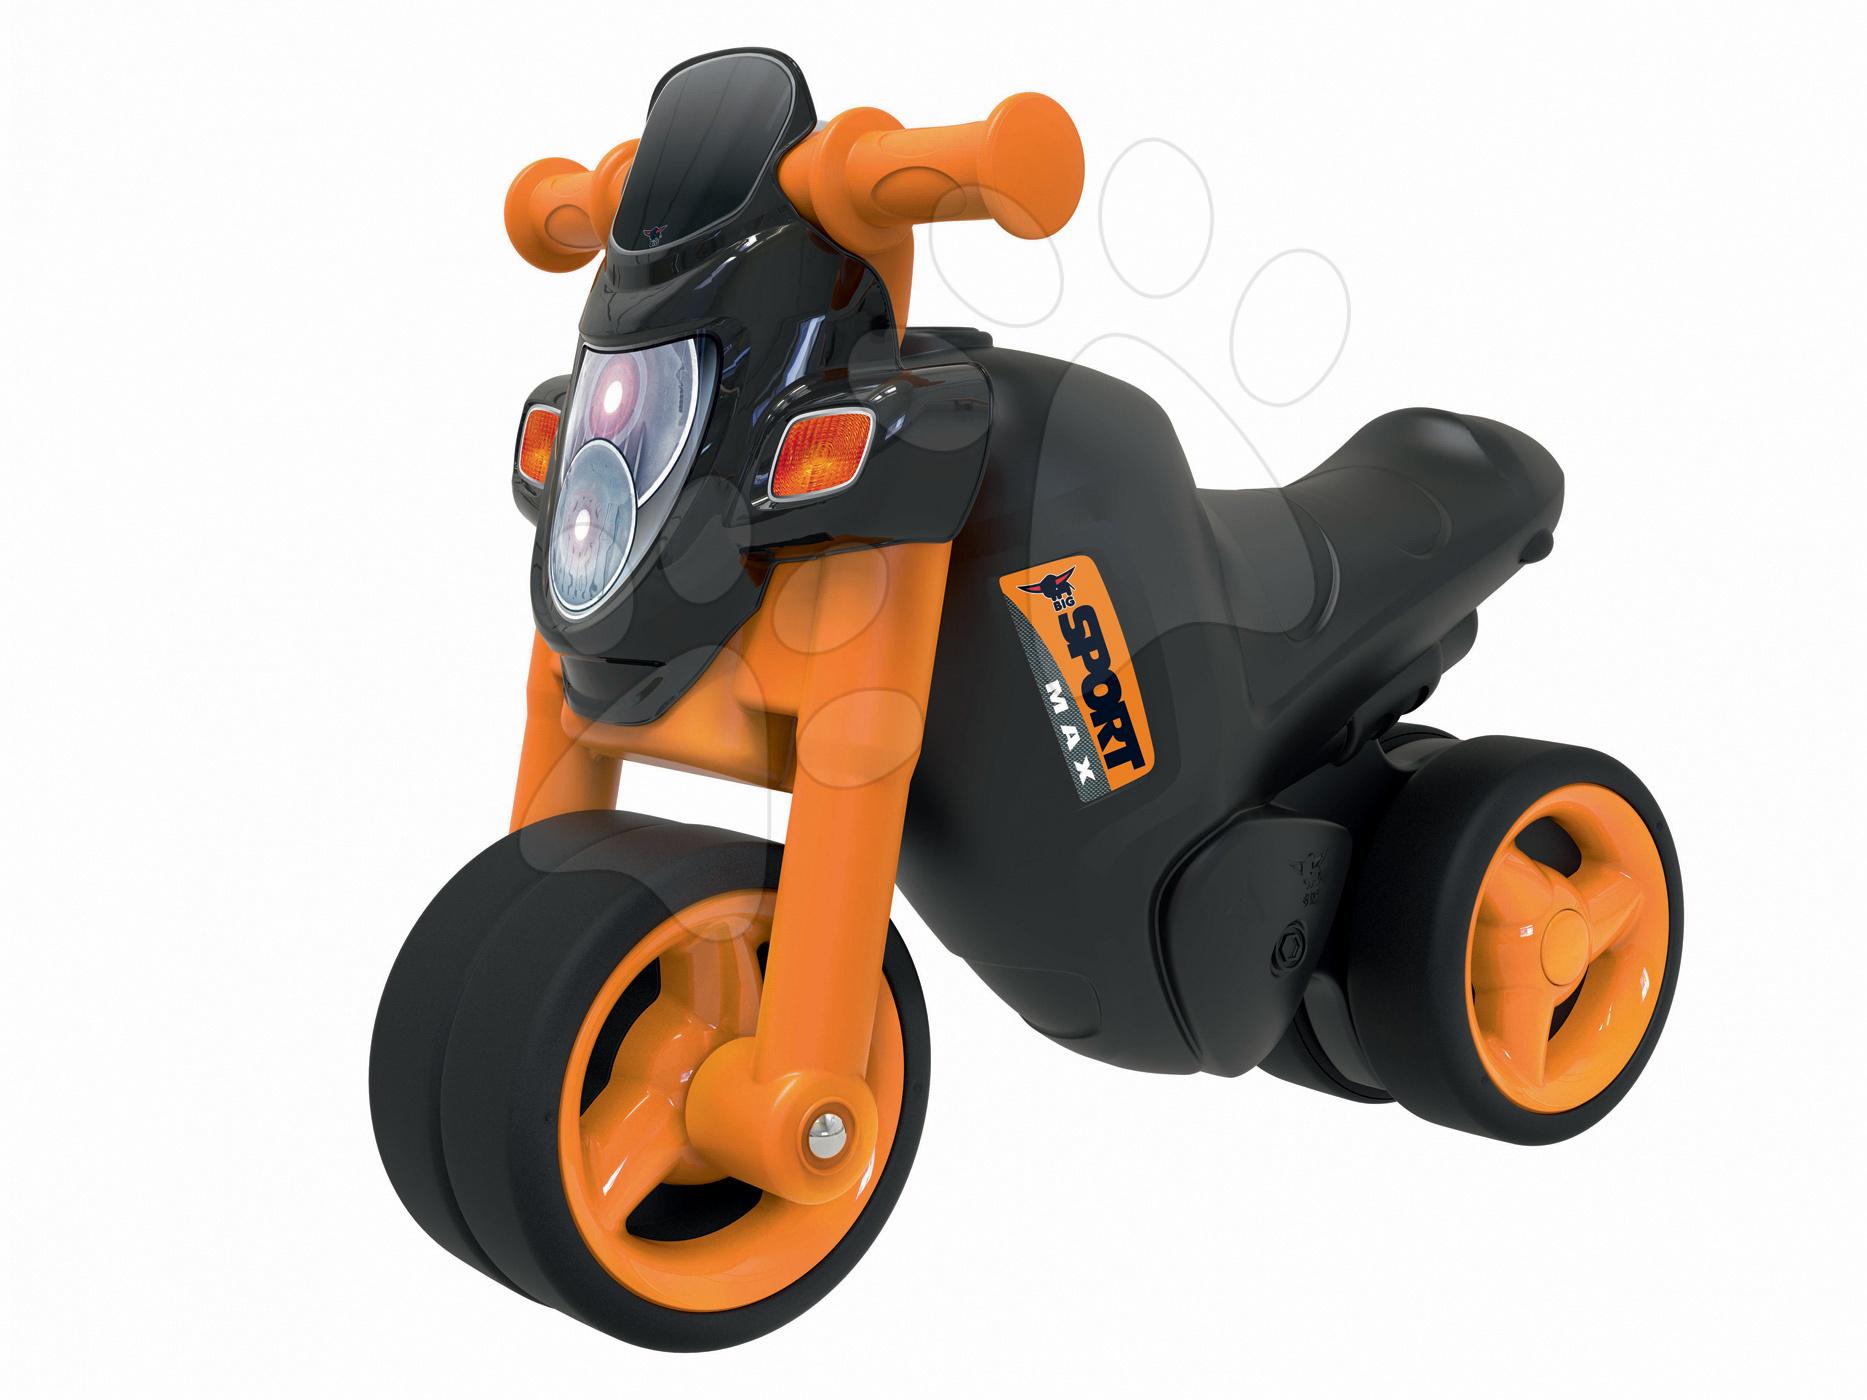 Babytaxiu motocicletă Sport Bike BIG cu claxon electronic negru-portocaliu de la 18 luni